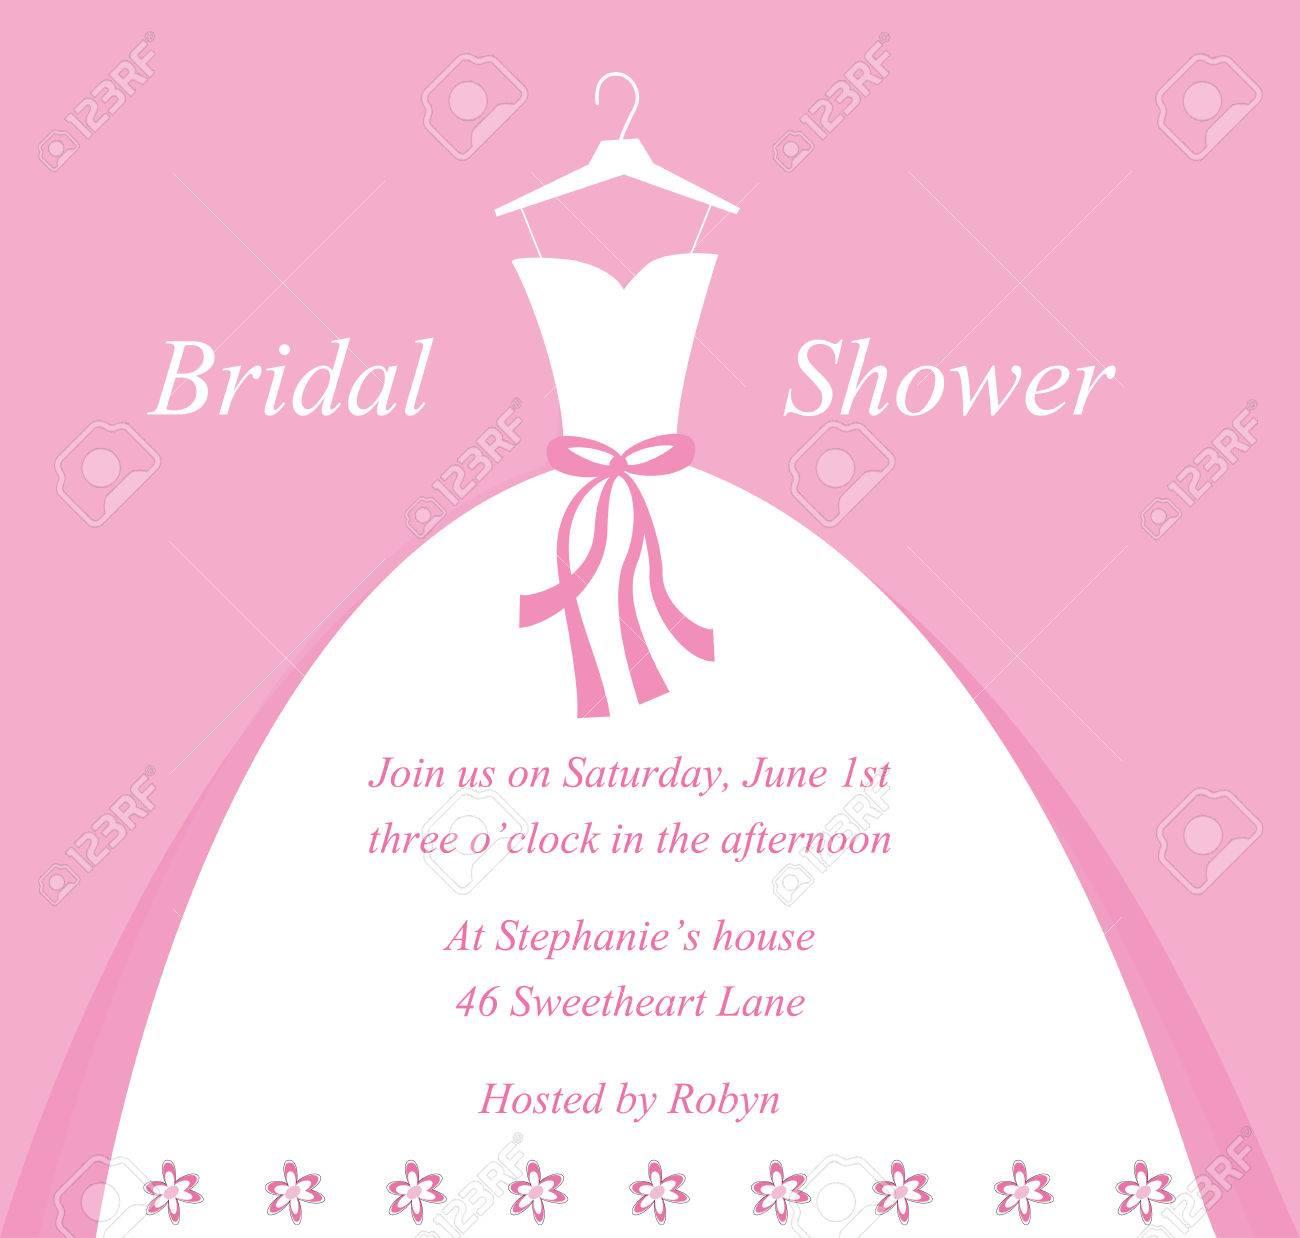 wedding bridal shower invitation royalty free cliparts vectors and rh 123rf com free bridal shower clipart for invitations free bridal shower clipart for invitations